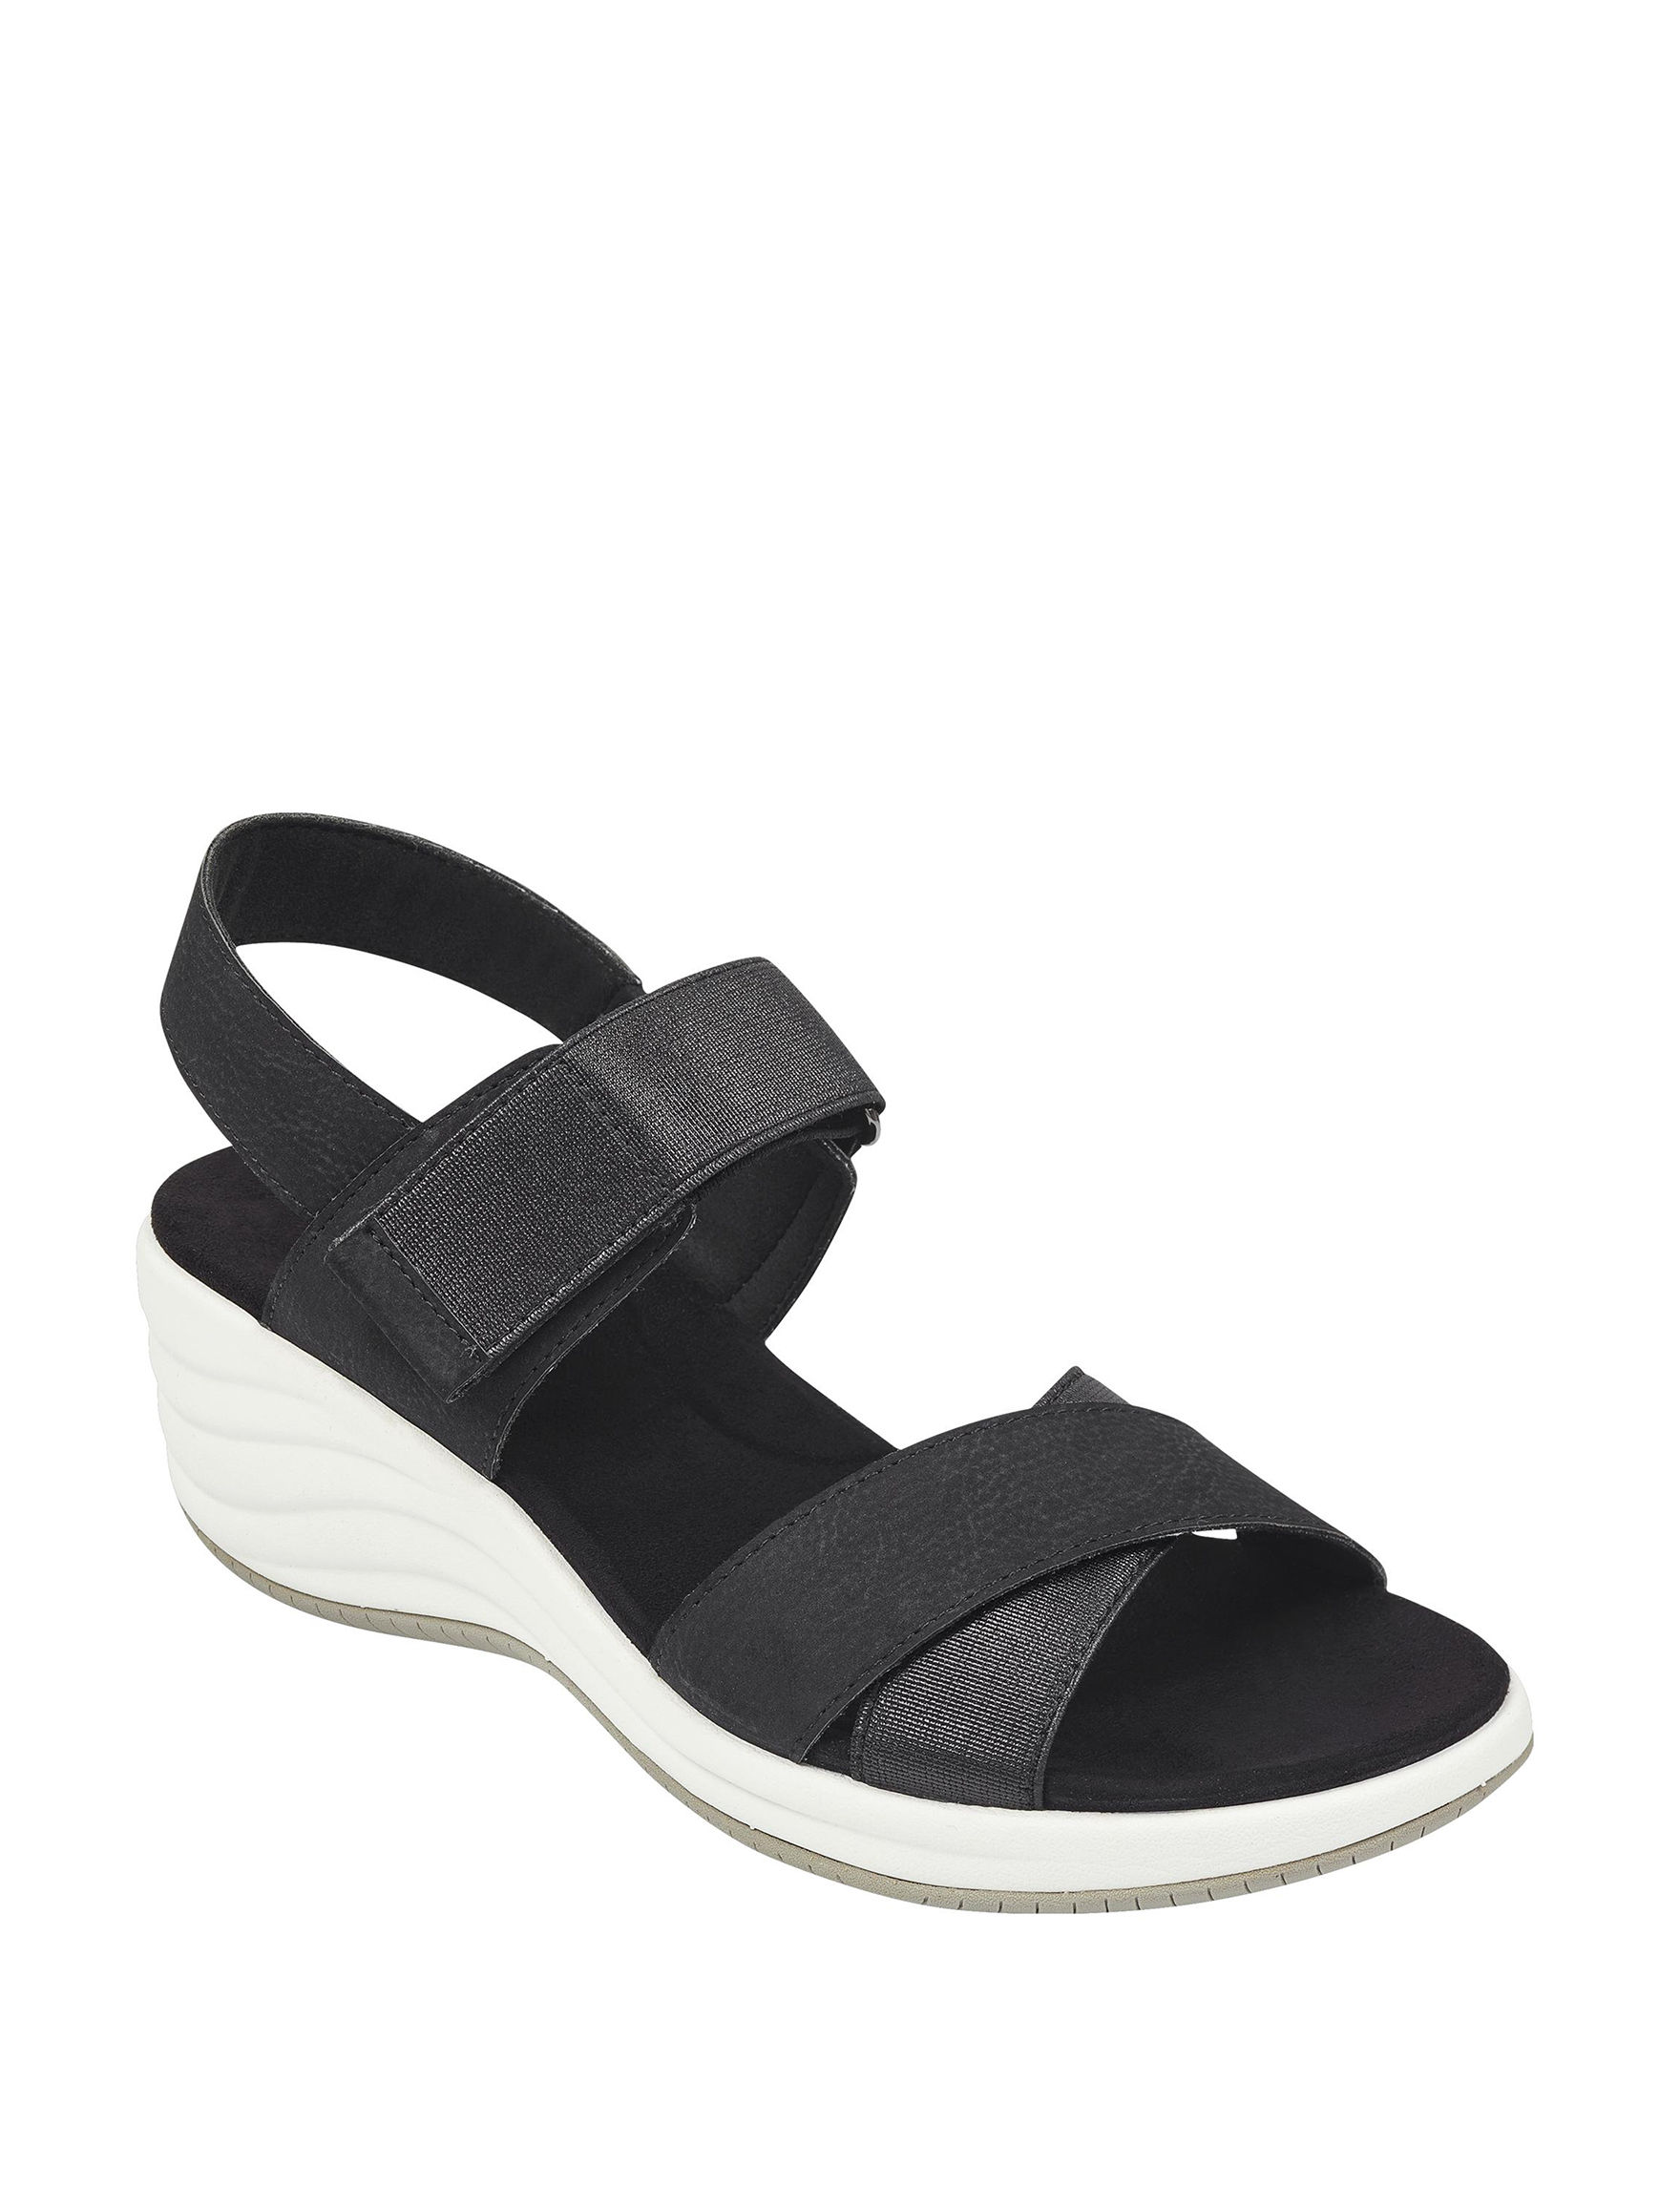 Easy Spirit Black Wedge Sandals